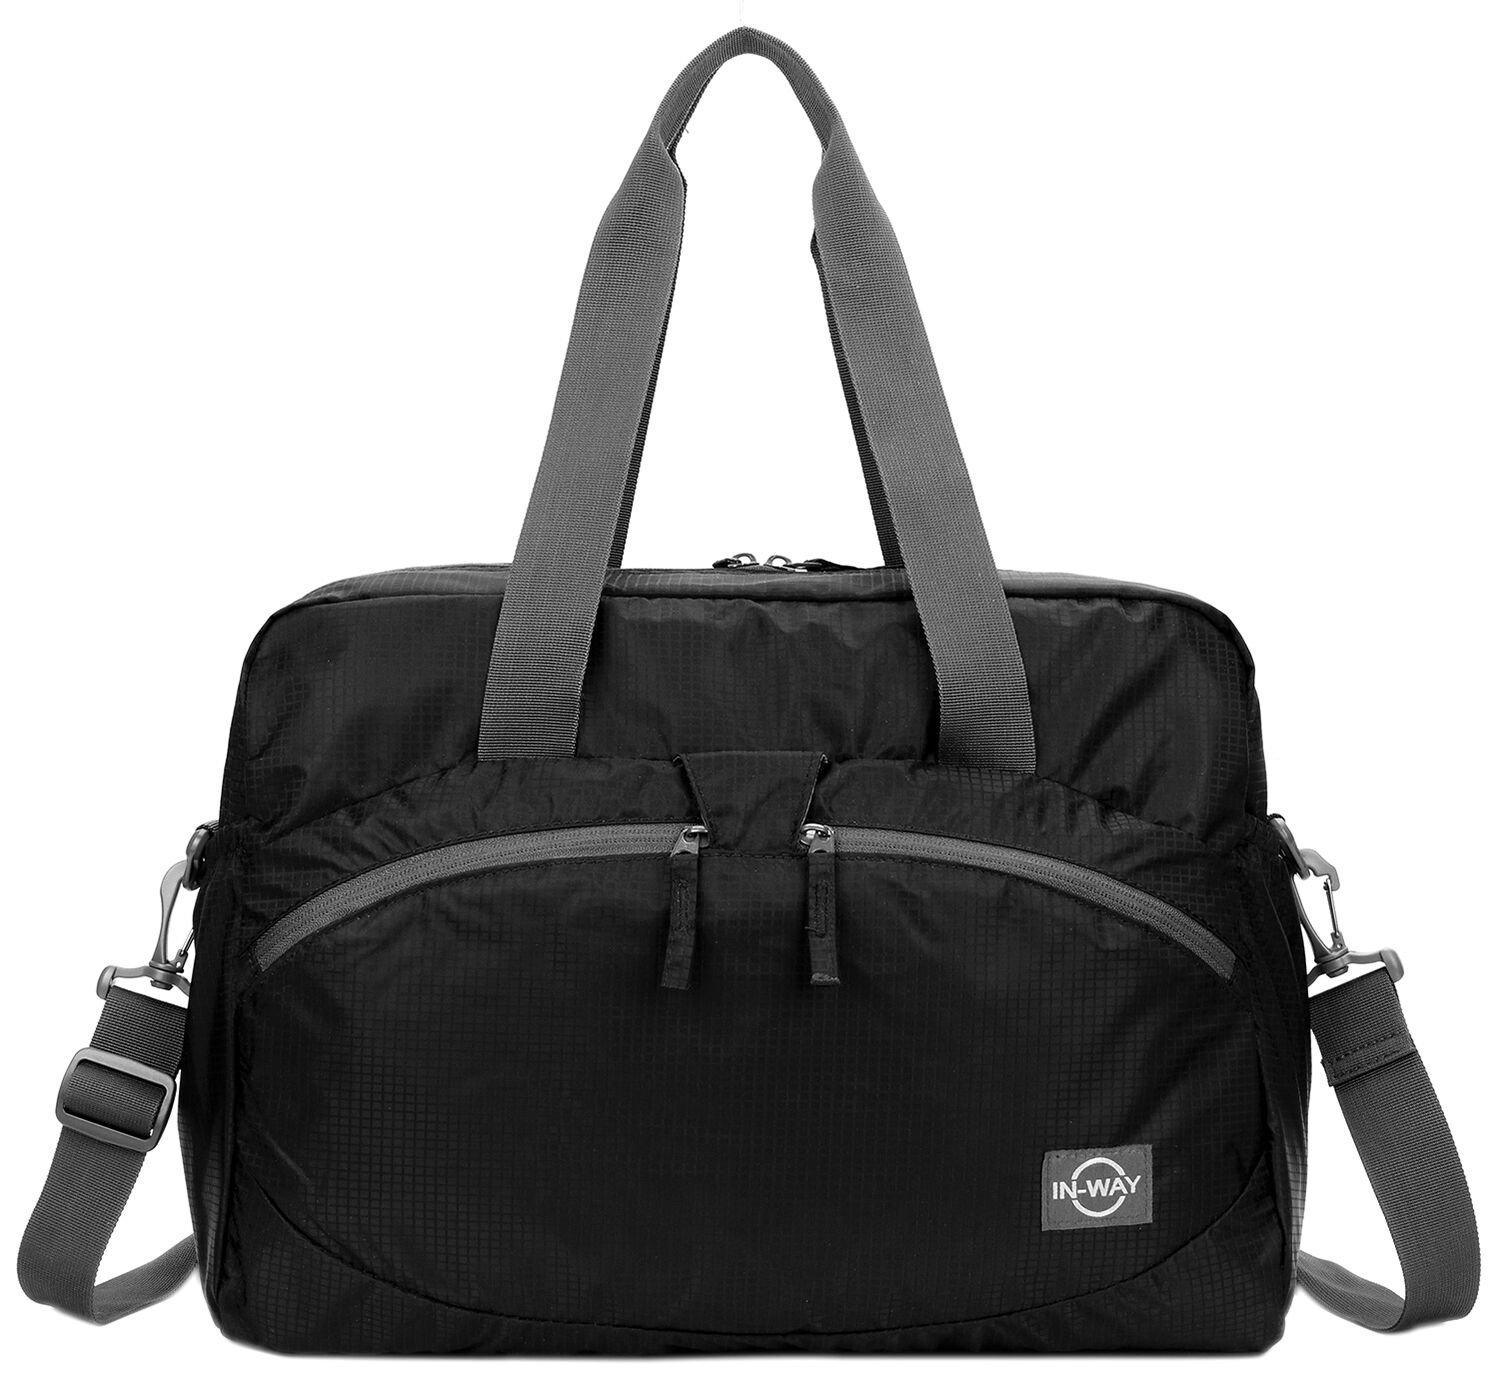 Forestfish Women's Lightweight Gym Tote Bag Waterproof Sports Handbag (Black Plus)